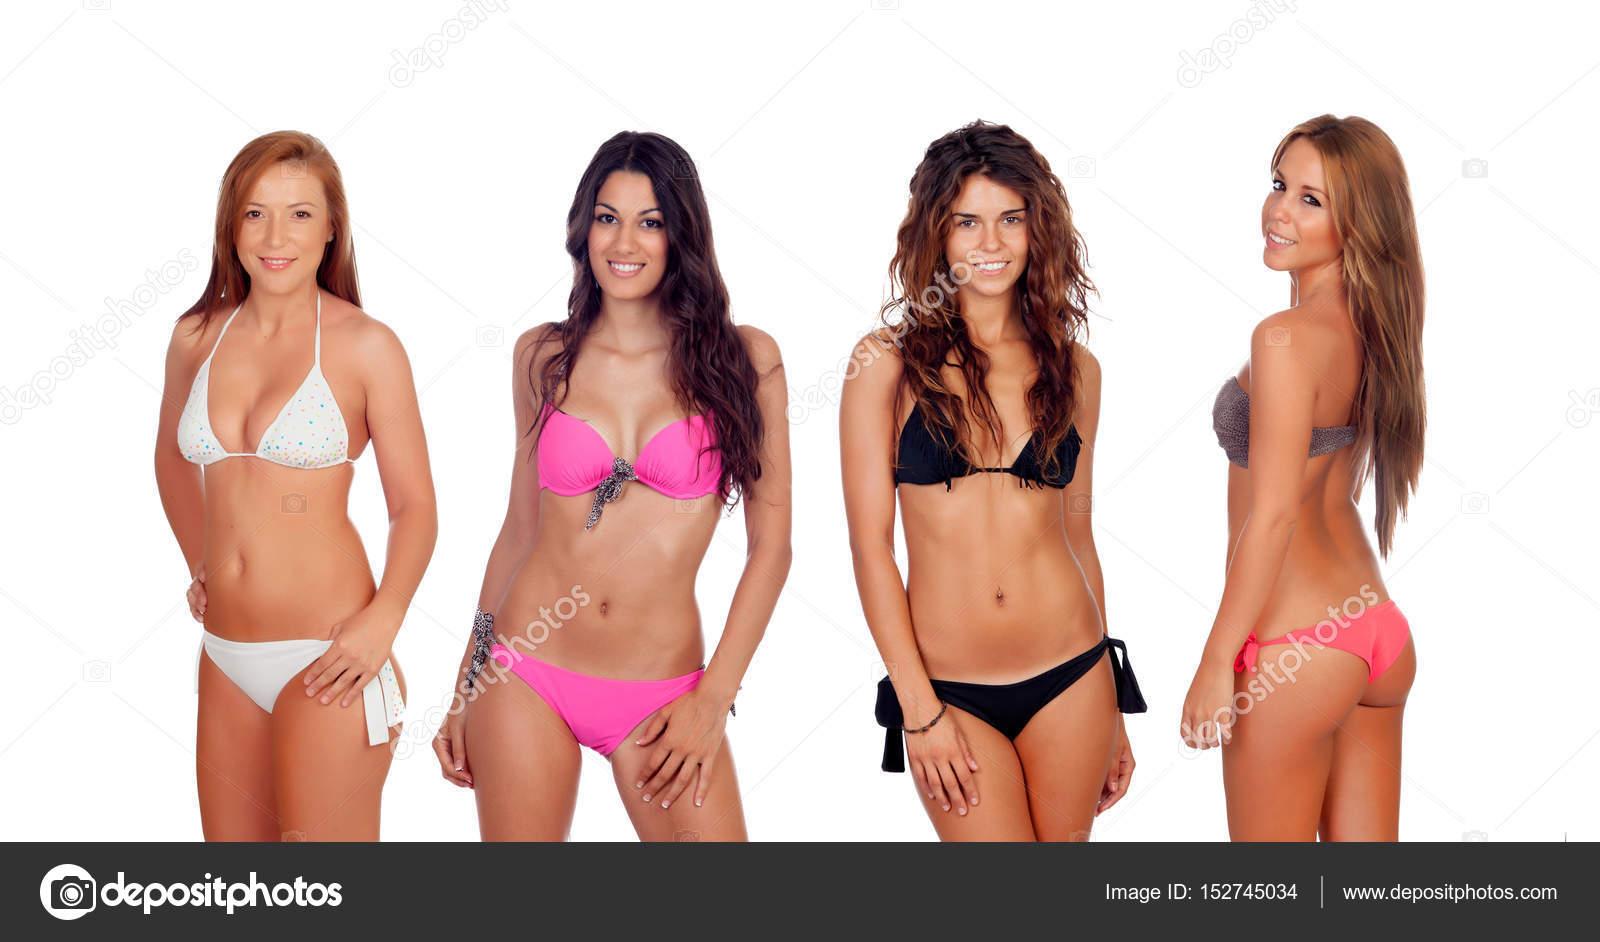 Bikini Guapas Chicas BlancosCuatro Bikinis En Con 9EeH2YDIbW